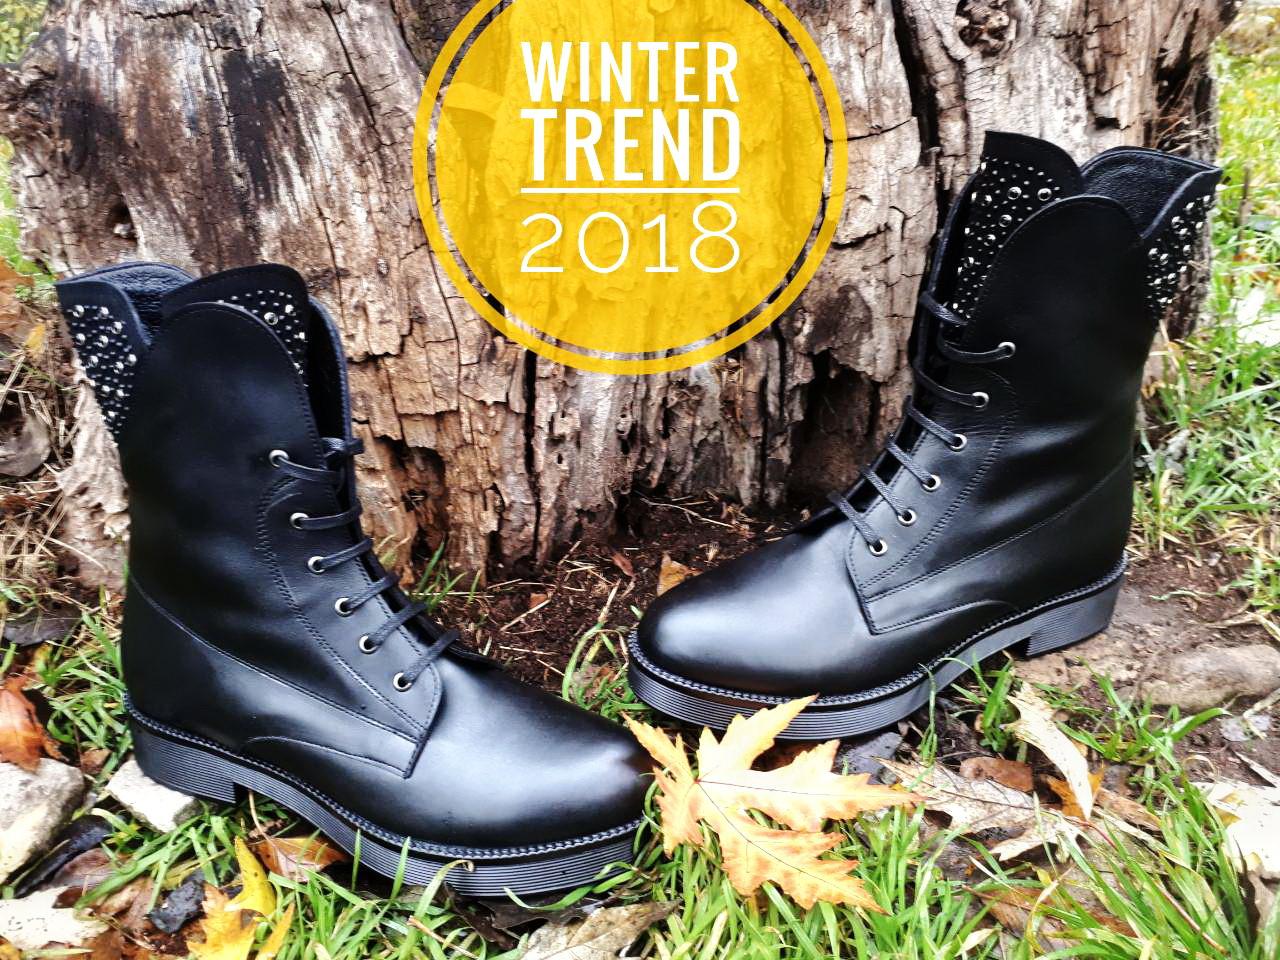 046b87703 Ttucino обувь ботинки женские зима на шнуровке кожаные с мехом на низком  каблуке Tucino